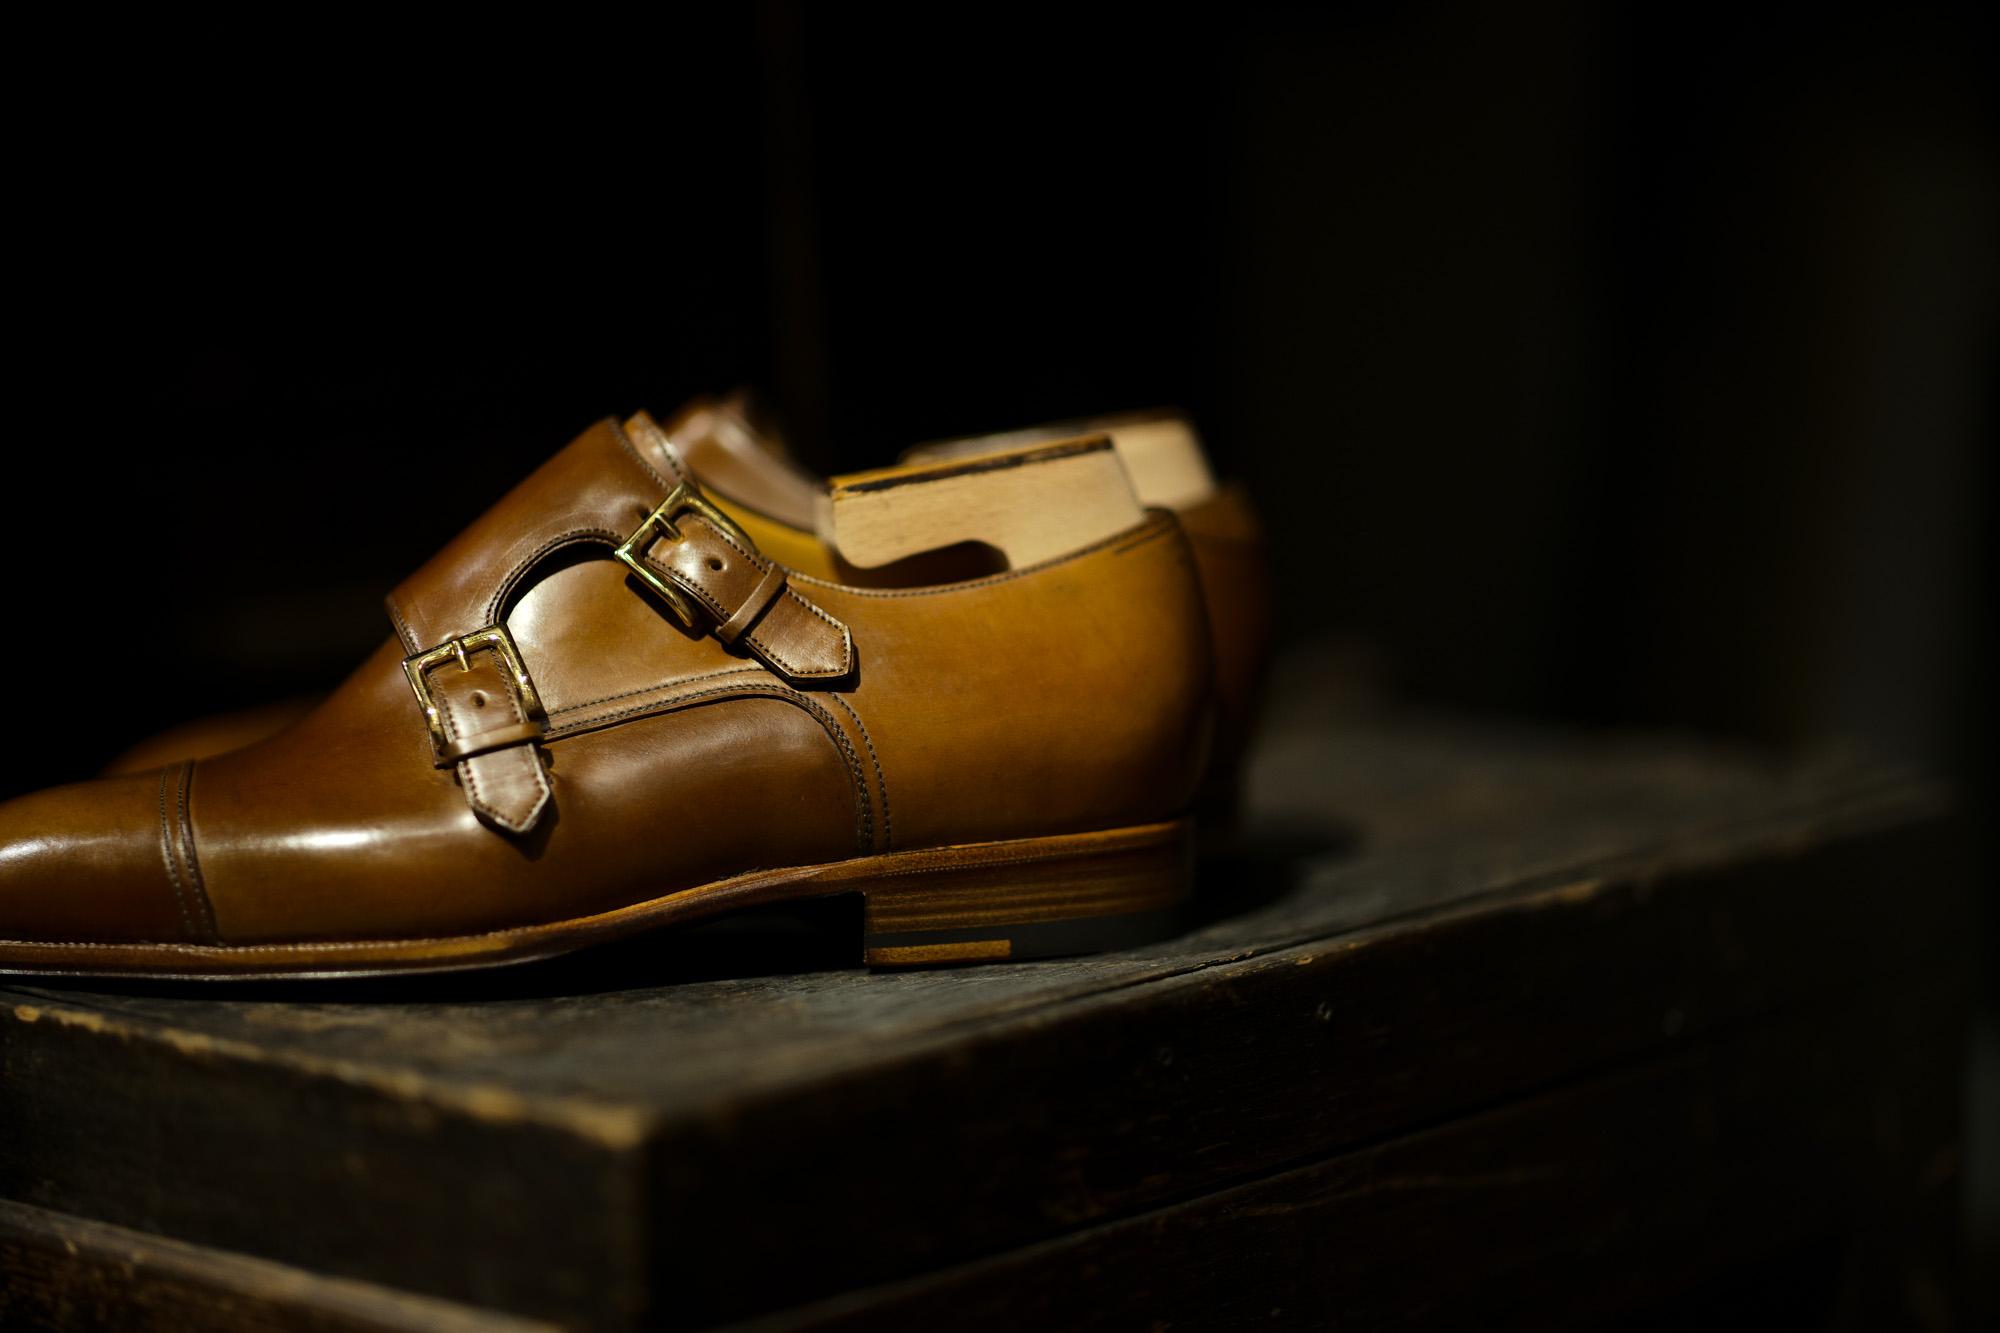 ENZO BONAFE (エンツォボナフェ) ART.EB-27 Double Monk Strap Shoes Horween Shell Cordovan Leather ホーウィン社シェルコードバンレザー ダブルモンクストラップシューズ BOURBON (バーボン) made in italy (イタリア製) 2020 愛知 名古屋 Alto e Diritto アルトエデリット